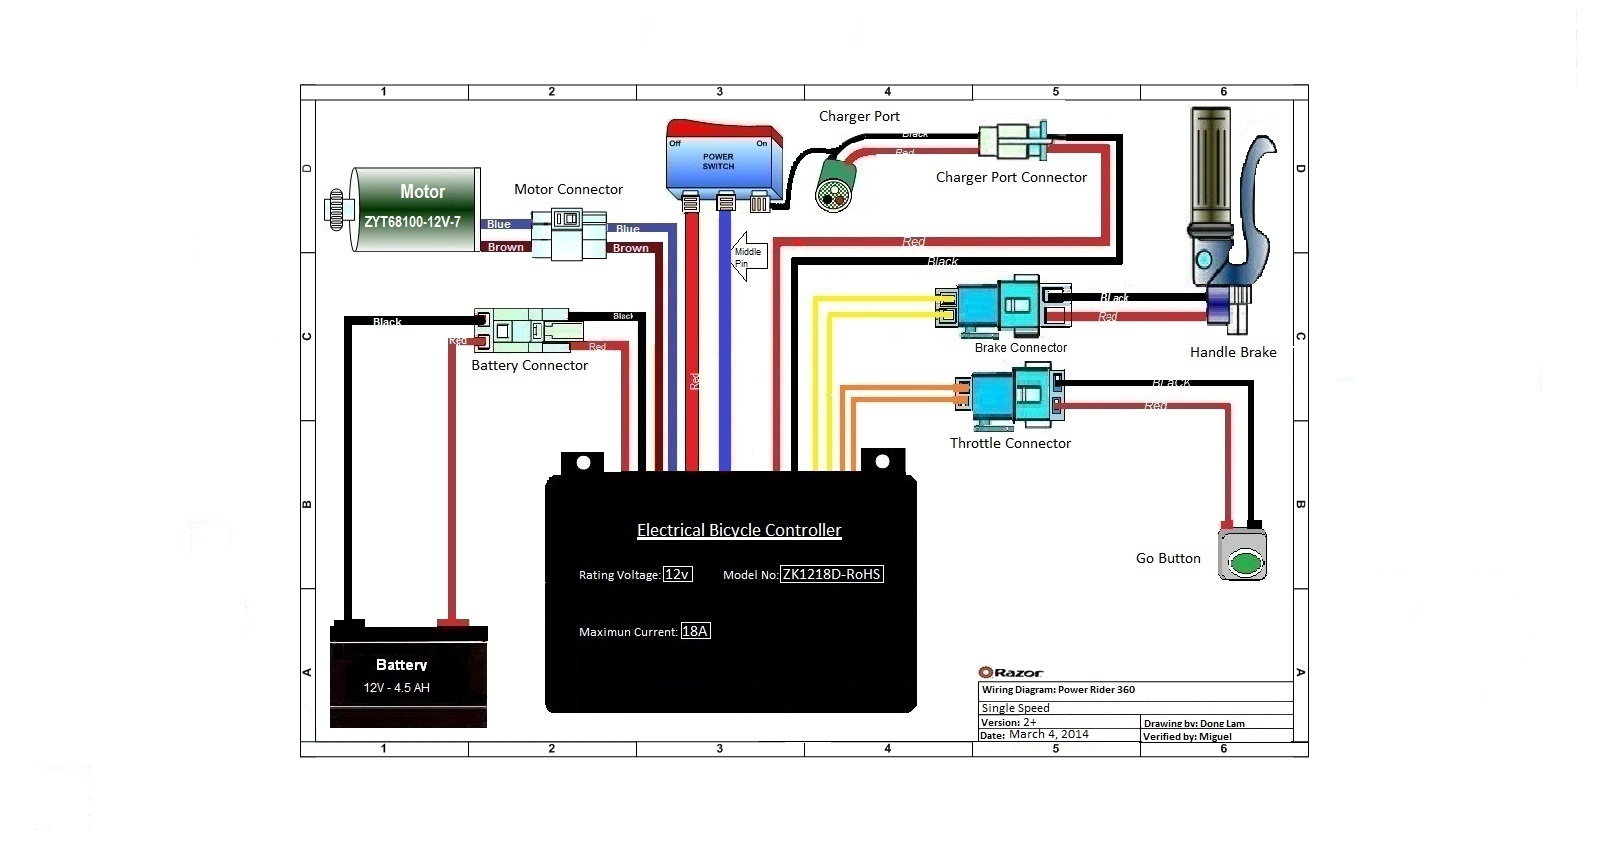 Power Wheels Dune Racer Wiring Diagram